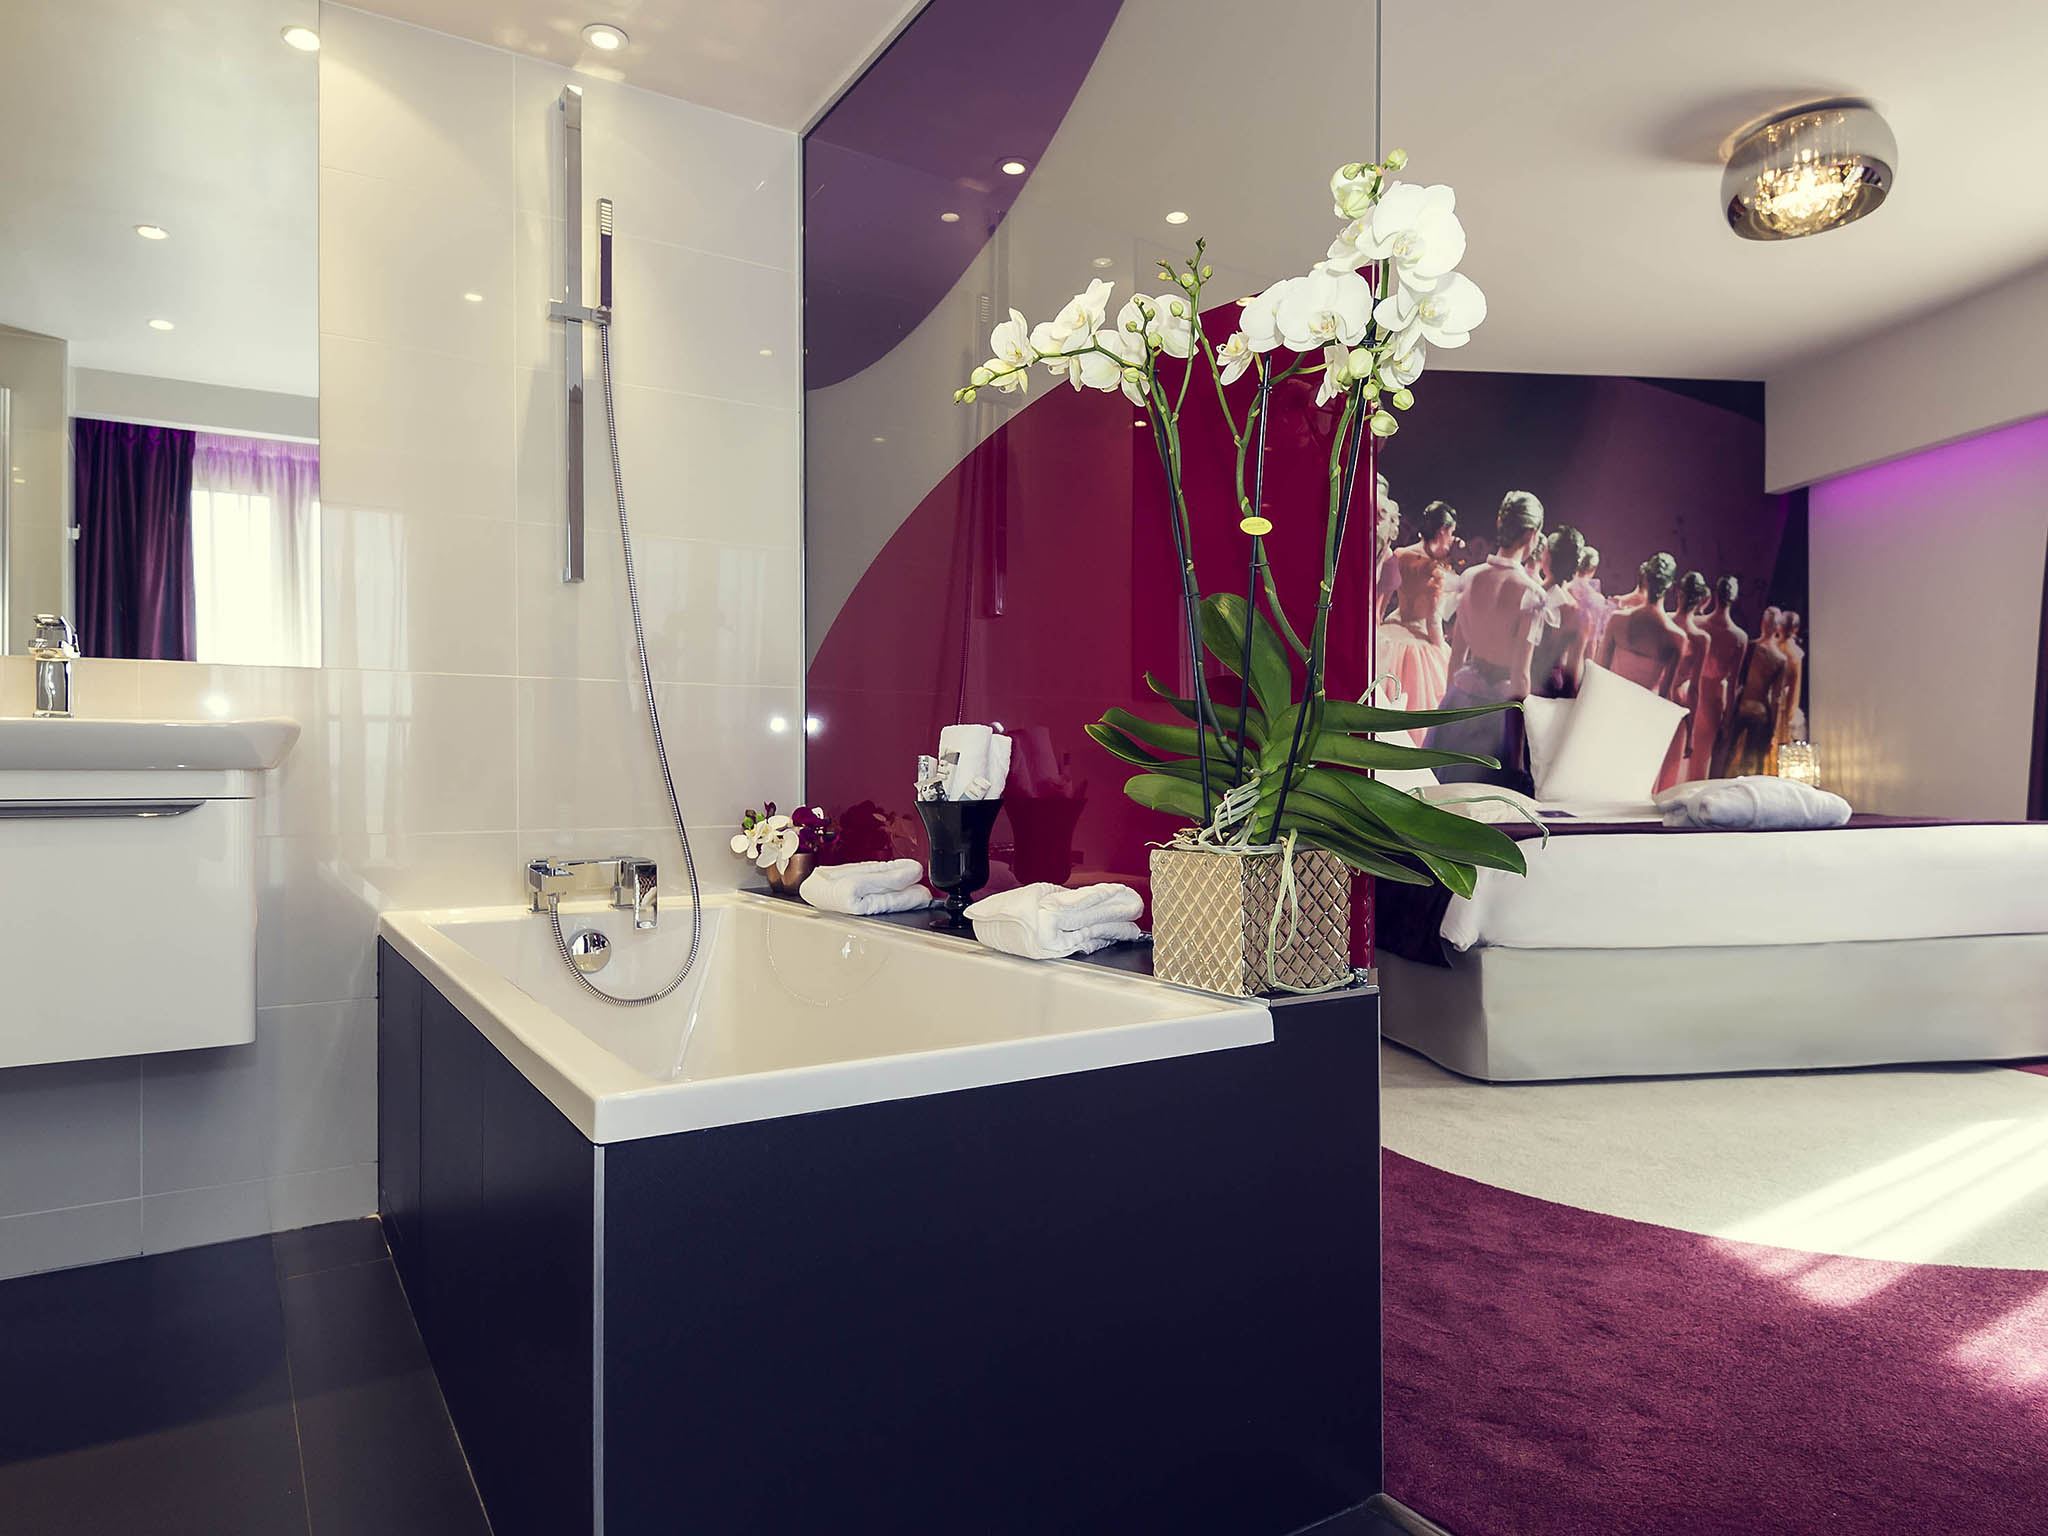 فندق - مركيور Mercure باريس بلاس ديتالي